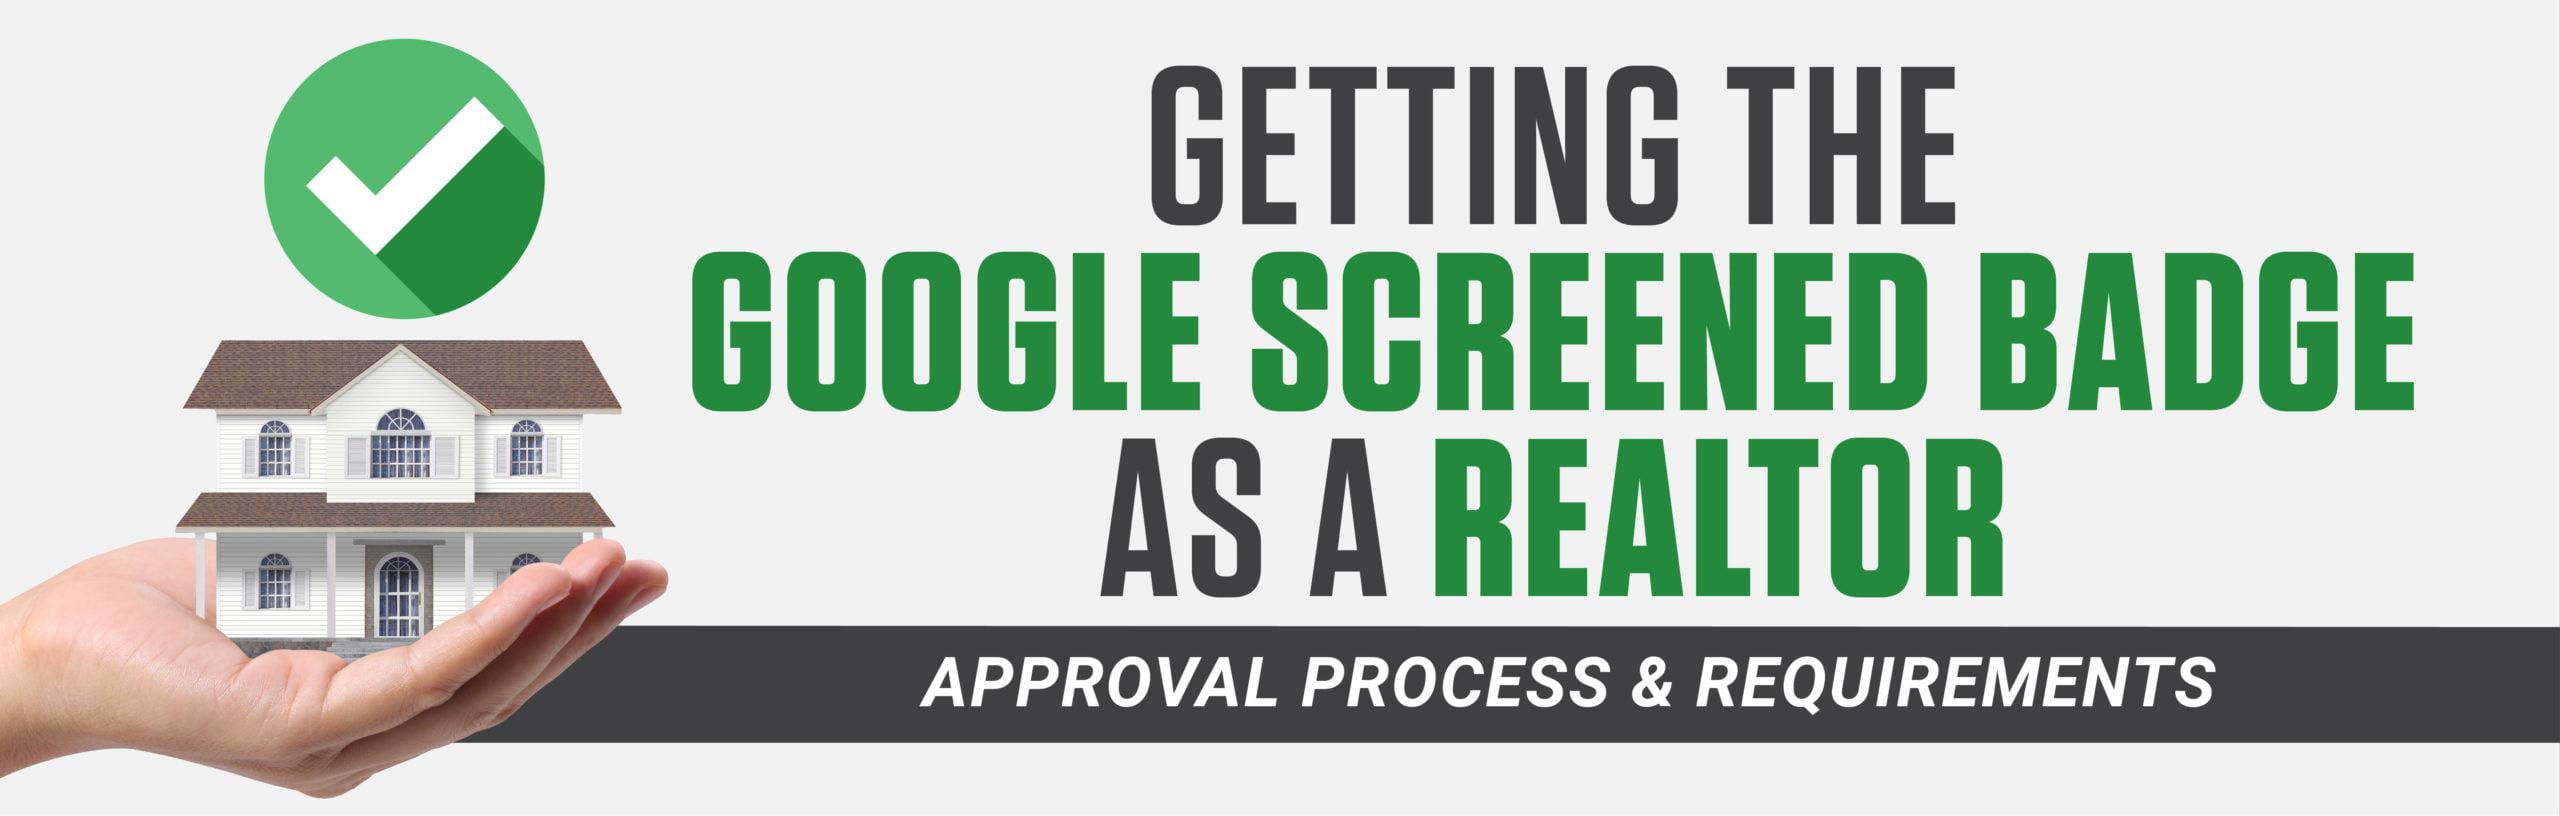 May Getting The Google Screened Badge Realtors 02